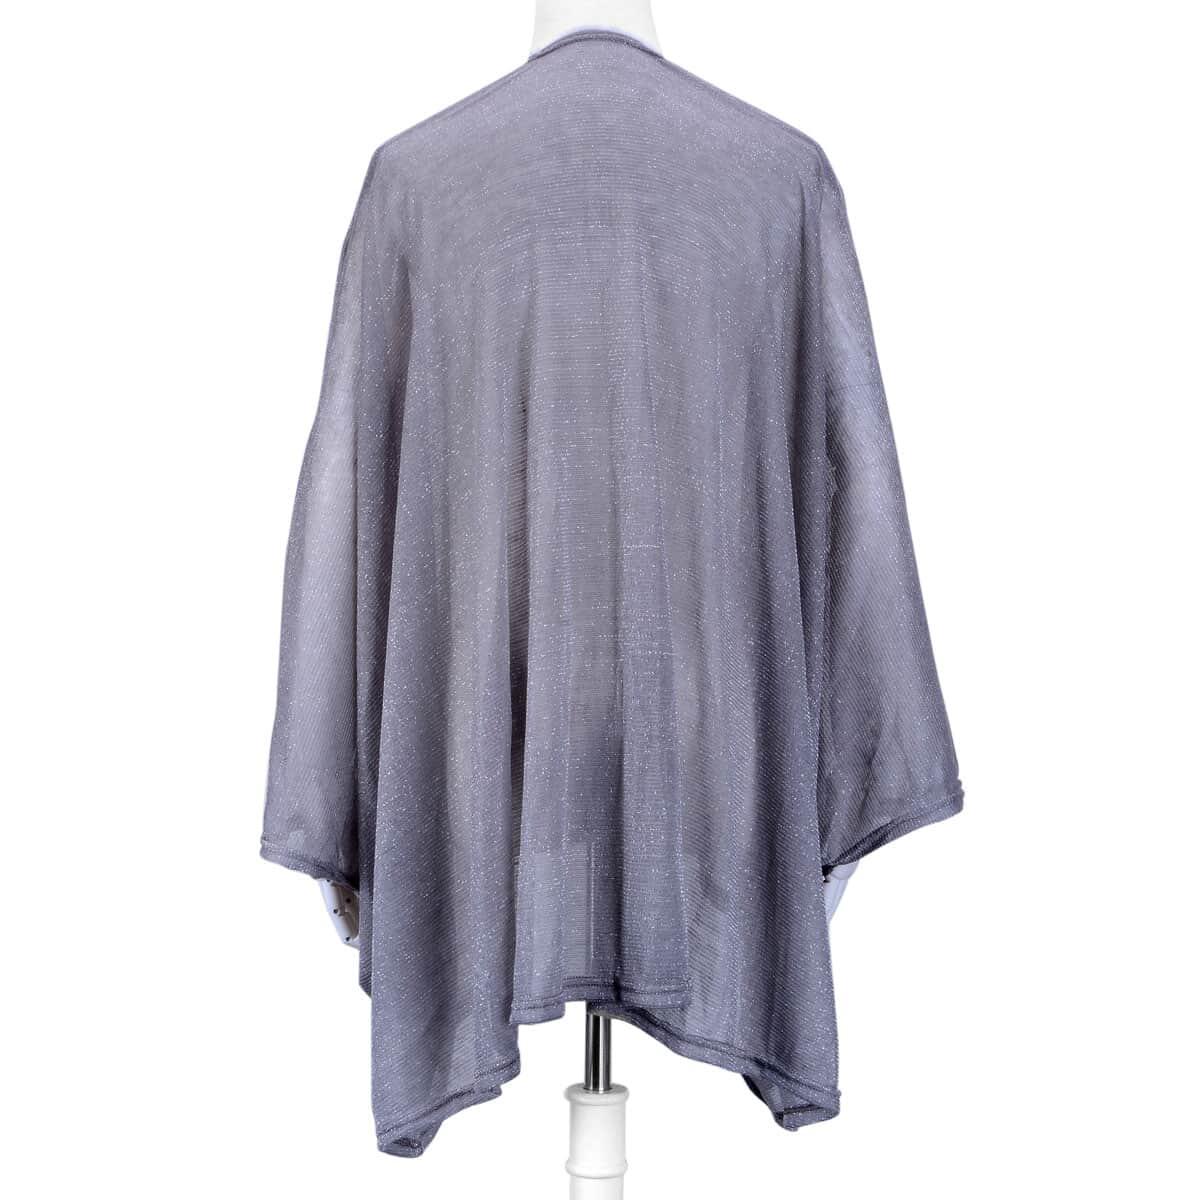 Gray 40% Acrylic, 40% Polyester and 20% Lurex Kimono